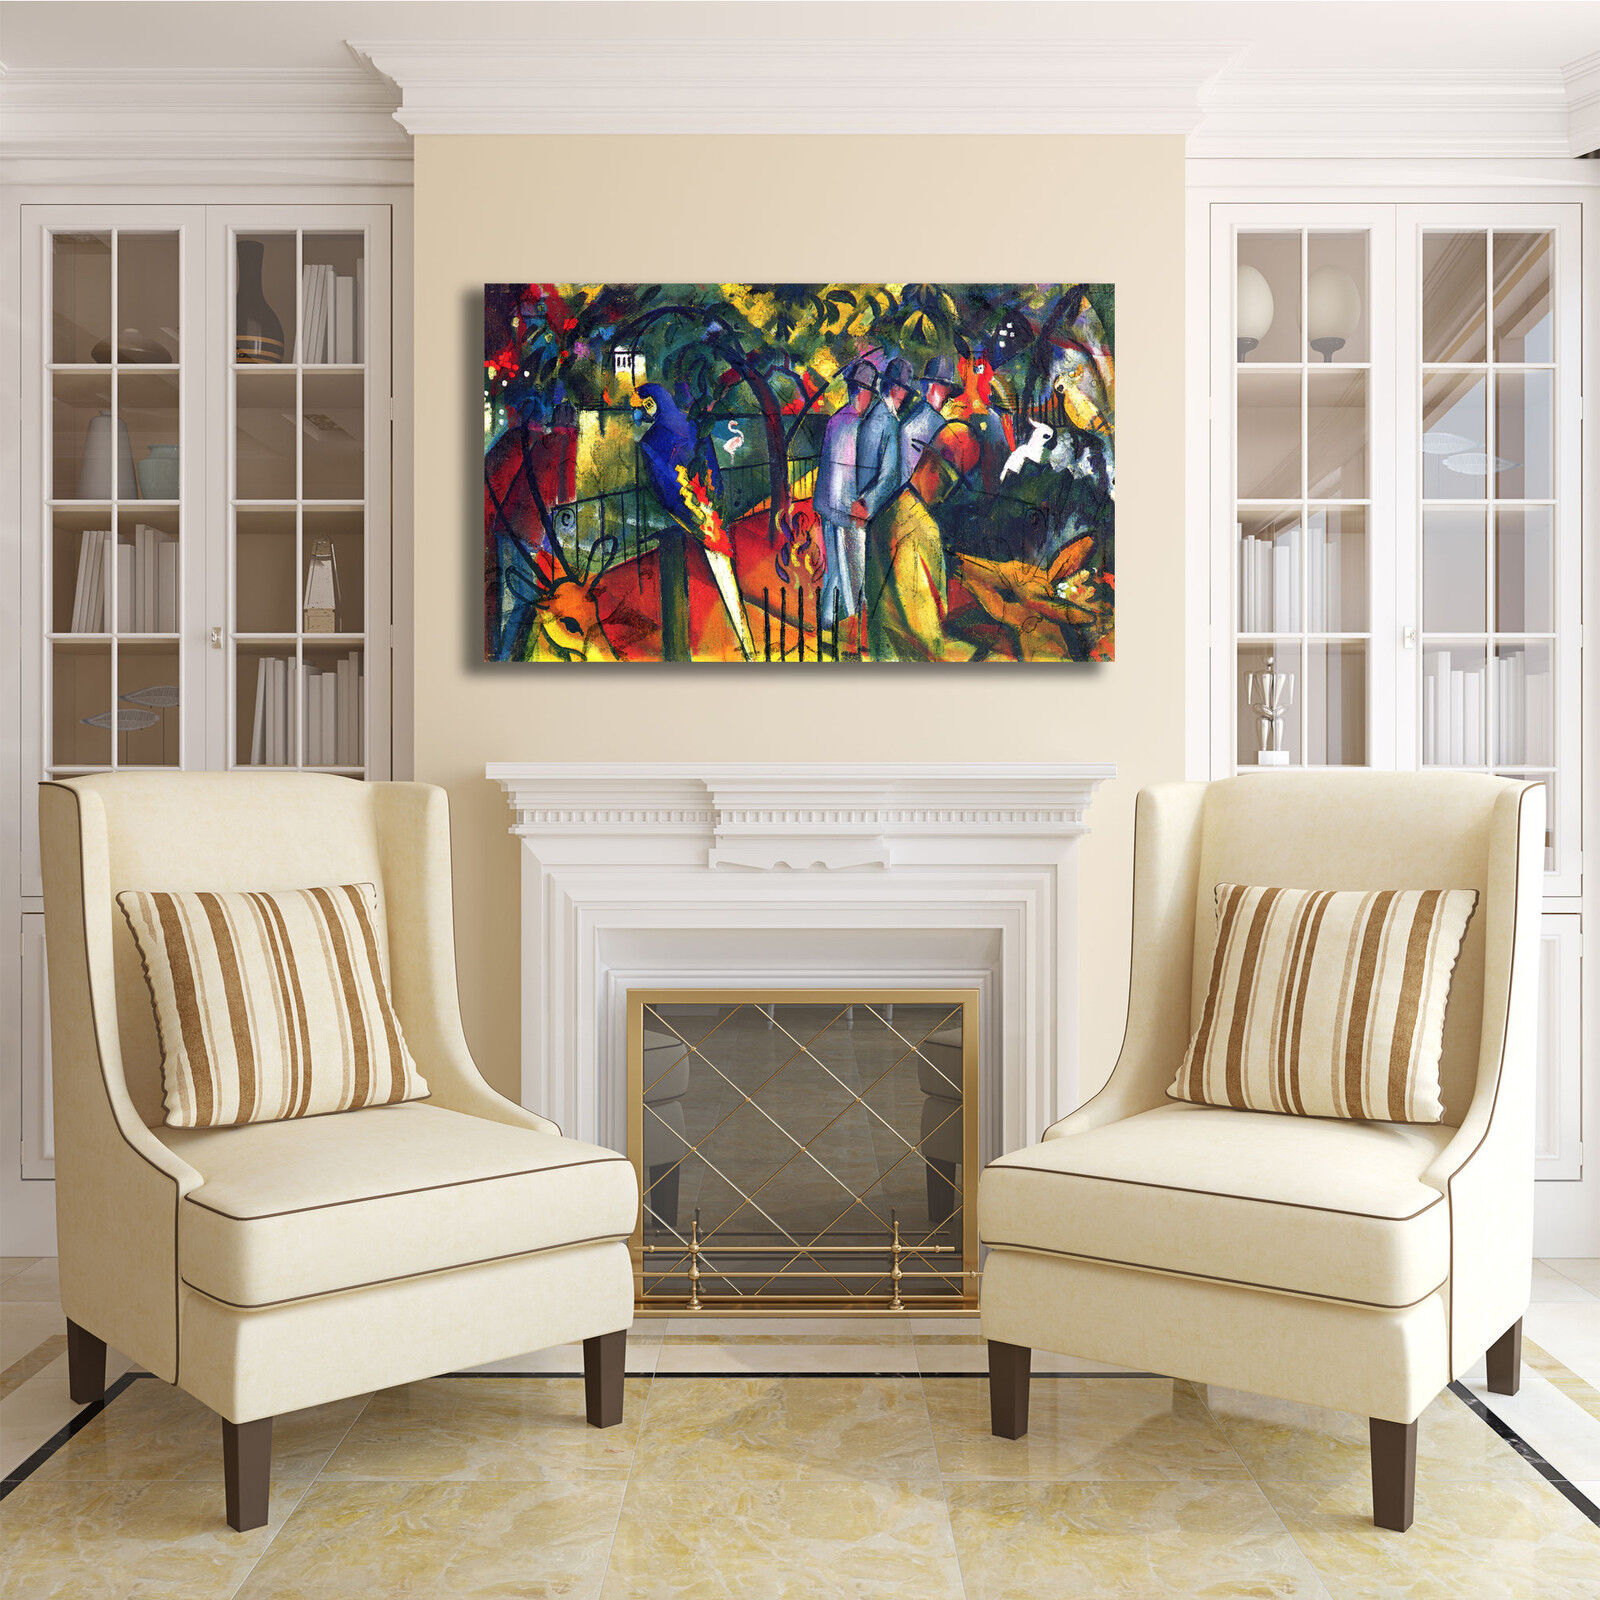 Macke giardino zoologico design arRouge quadro stampa tela dipinto telaio arRouge design o casa 8d194a